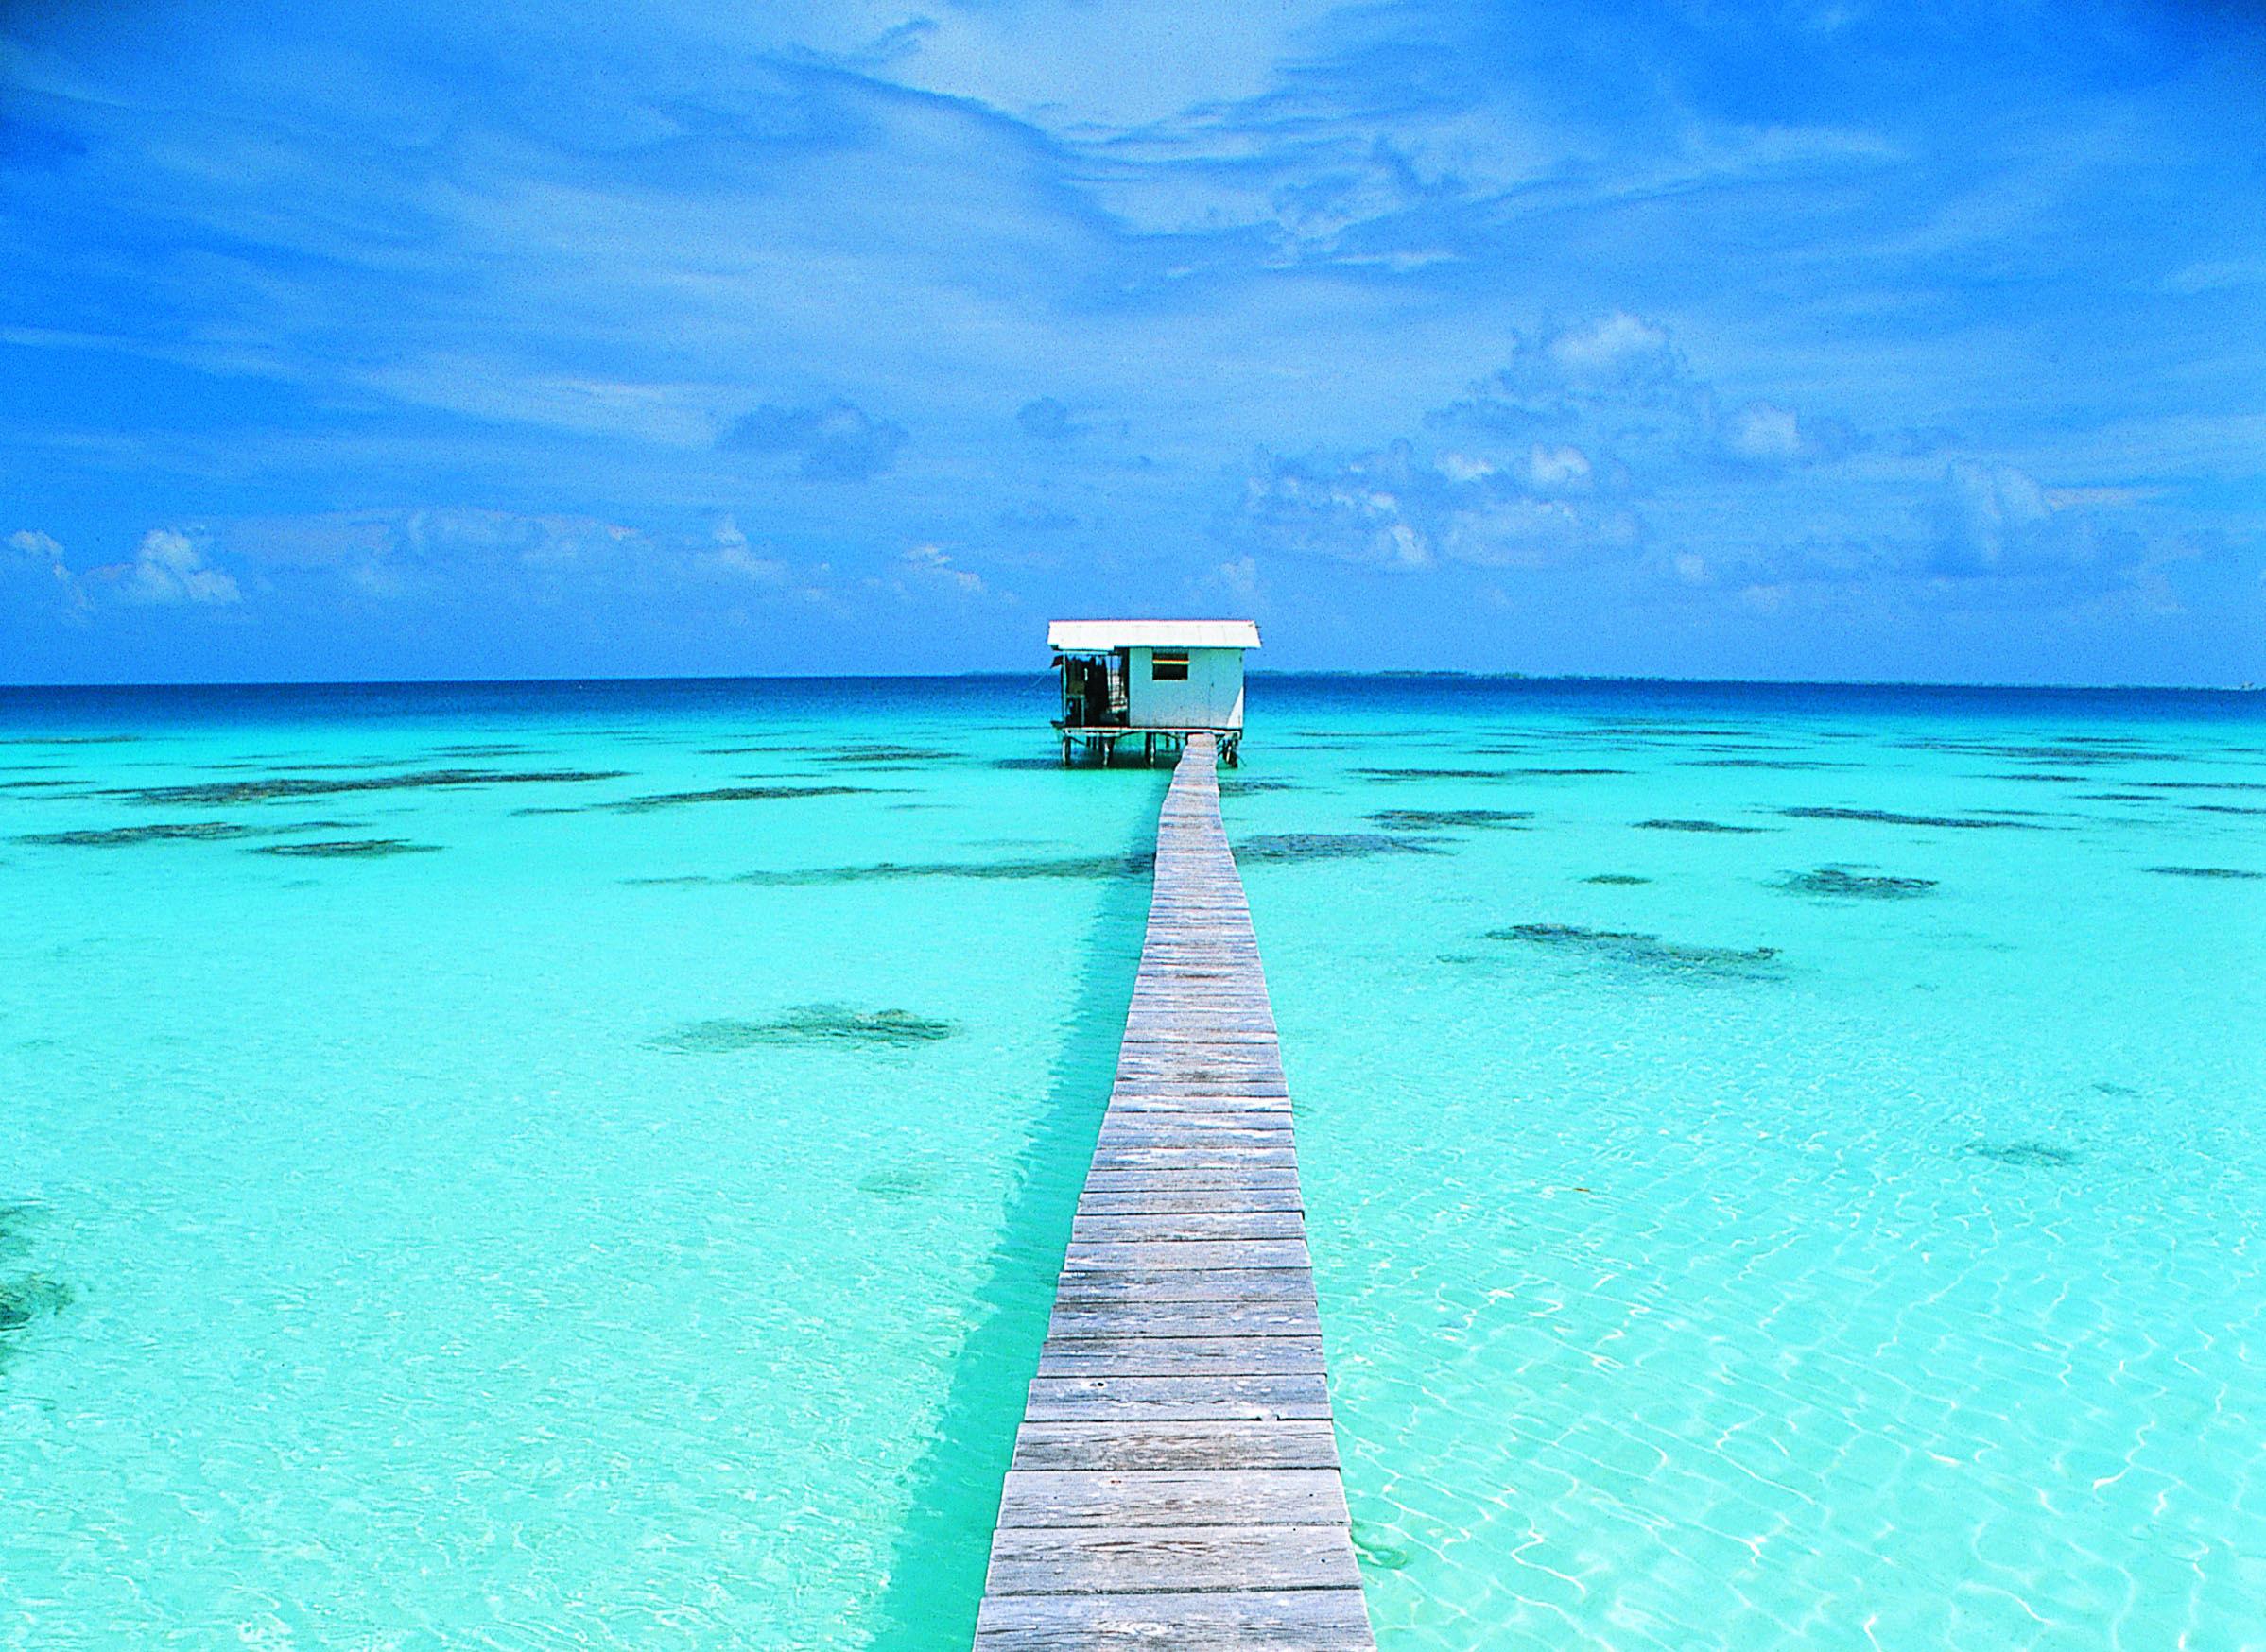 Dunk Island Holidays: Dunk Island Australia Turquoise Water